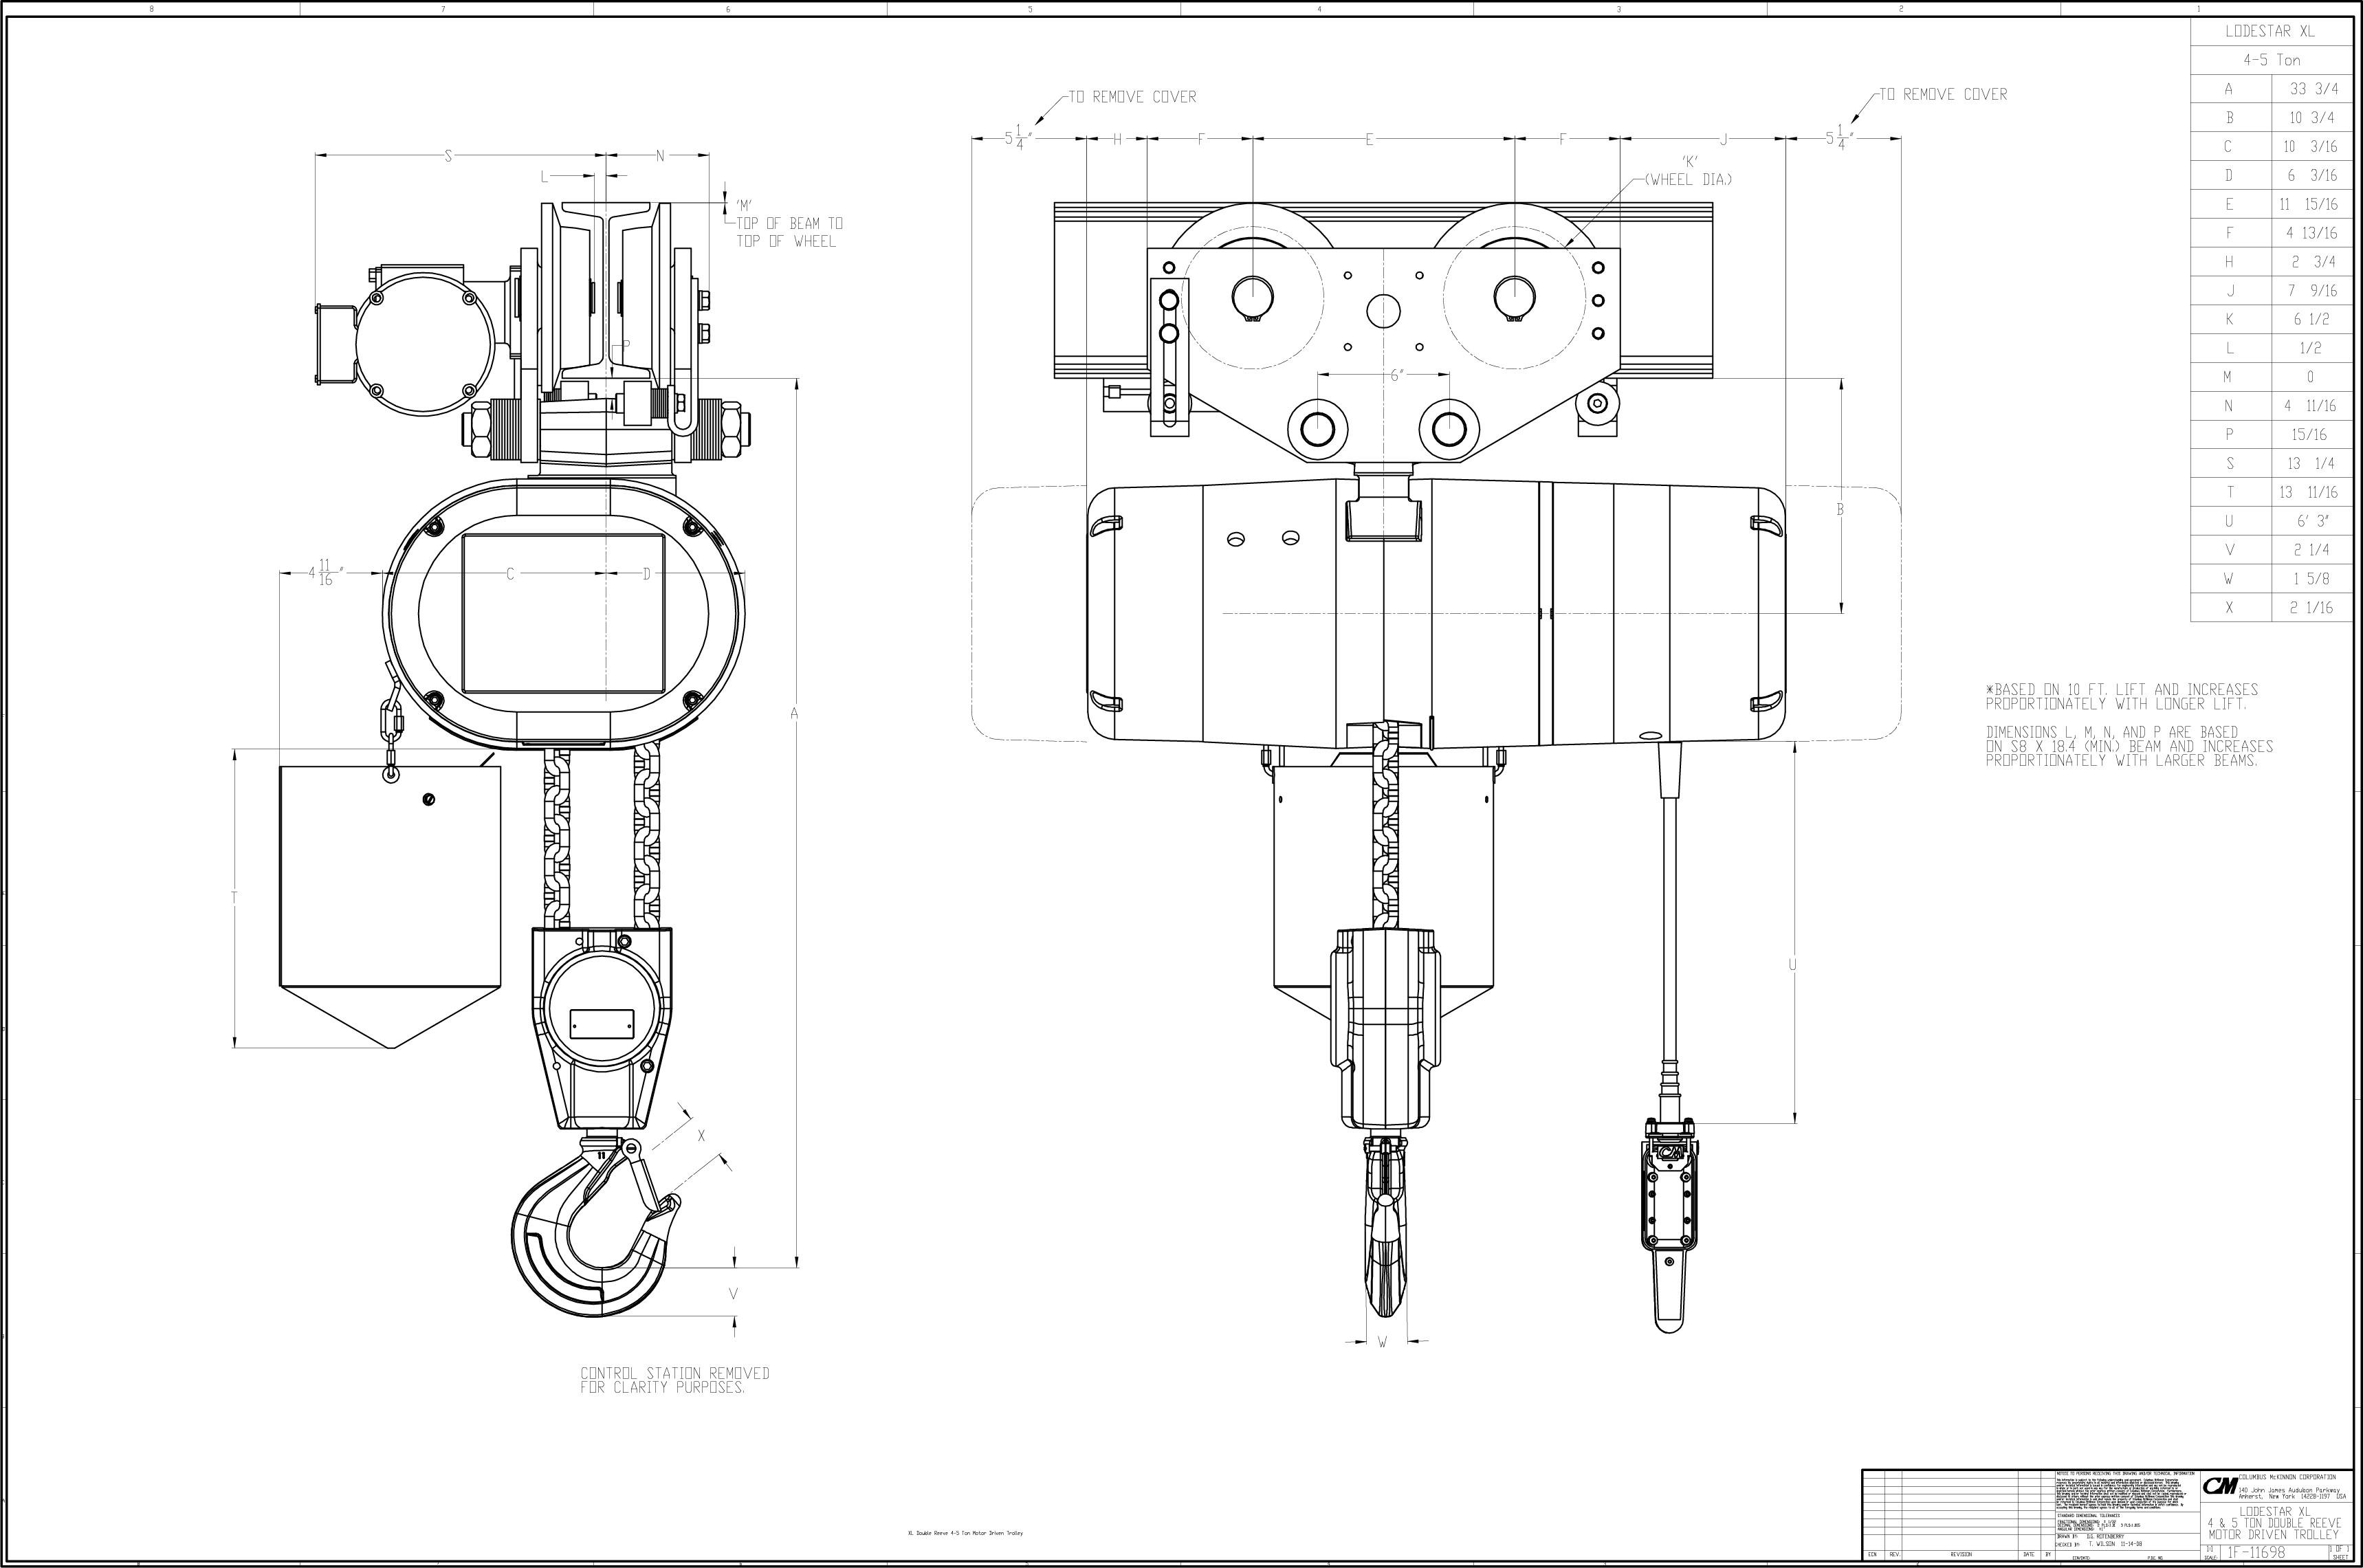 cm lodestar wiring diagram   wiring diagram on cm shopstar hoist